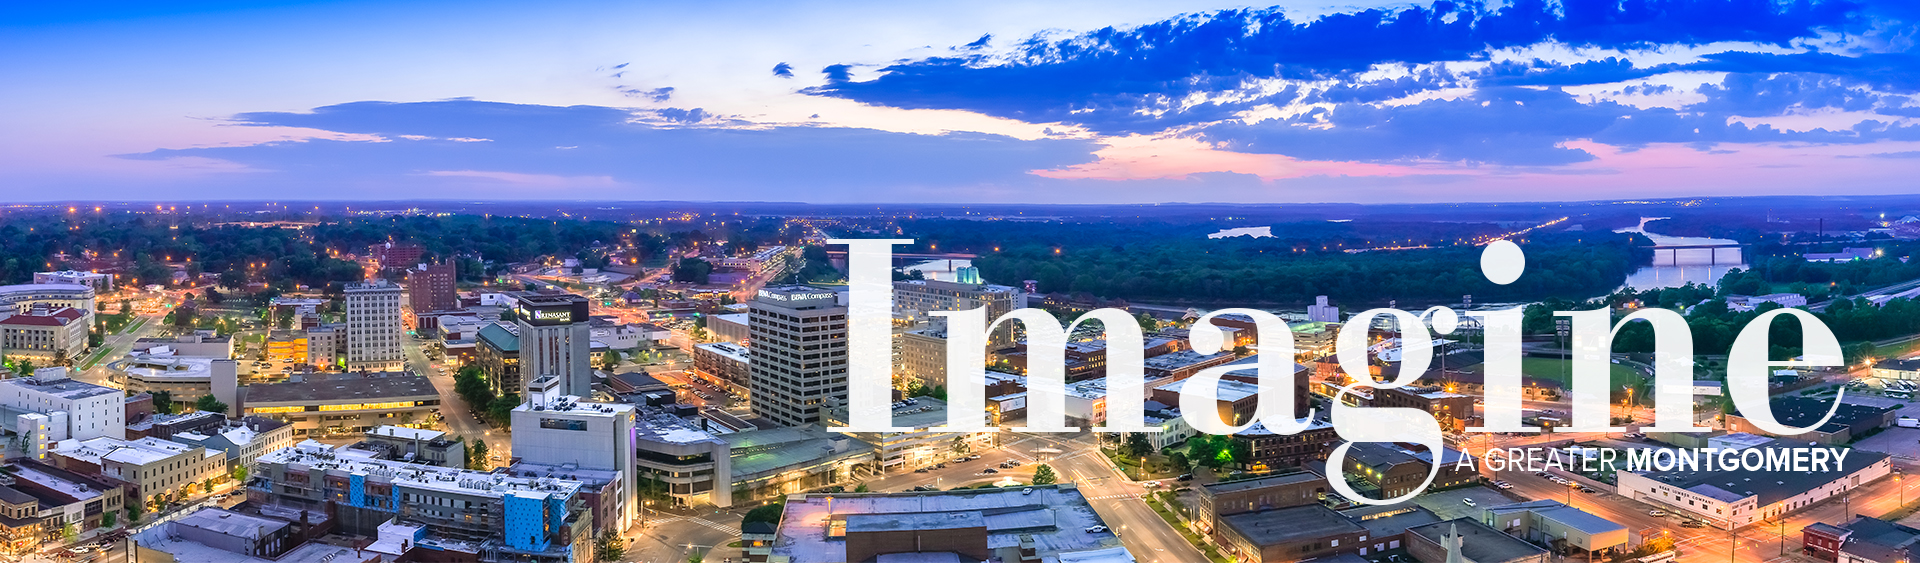 Eric Salas, Montgomery Skyline, Montgomery Area Chamber of Commerce,Montgomery Chamber, MGMChamber, Downtown Montgomery, Montgomery Alabama, Imagine A Greater Montgomery